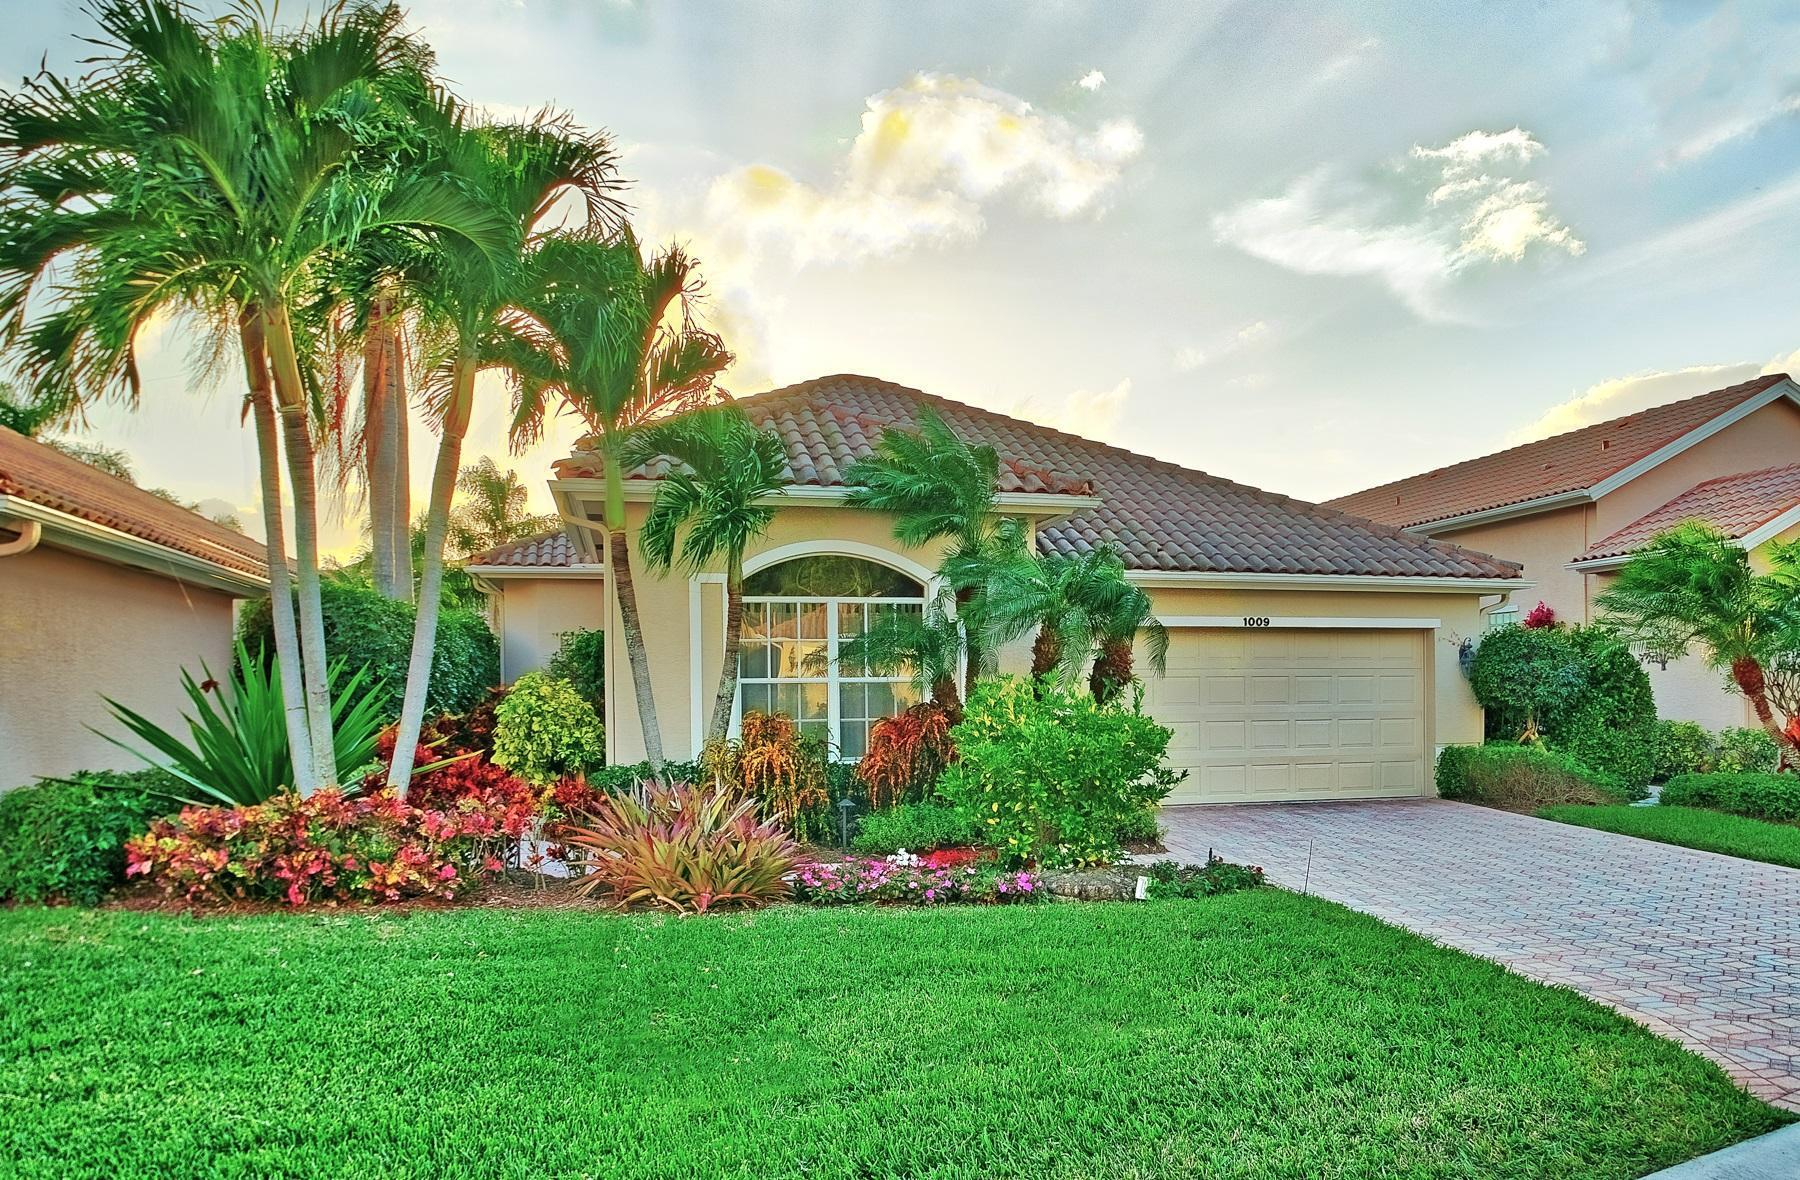 Listing: 1009 Diamond Head Way, Palm Beach Gardens, FL.| MLS# RX ...